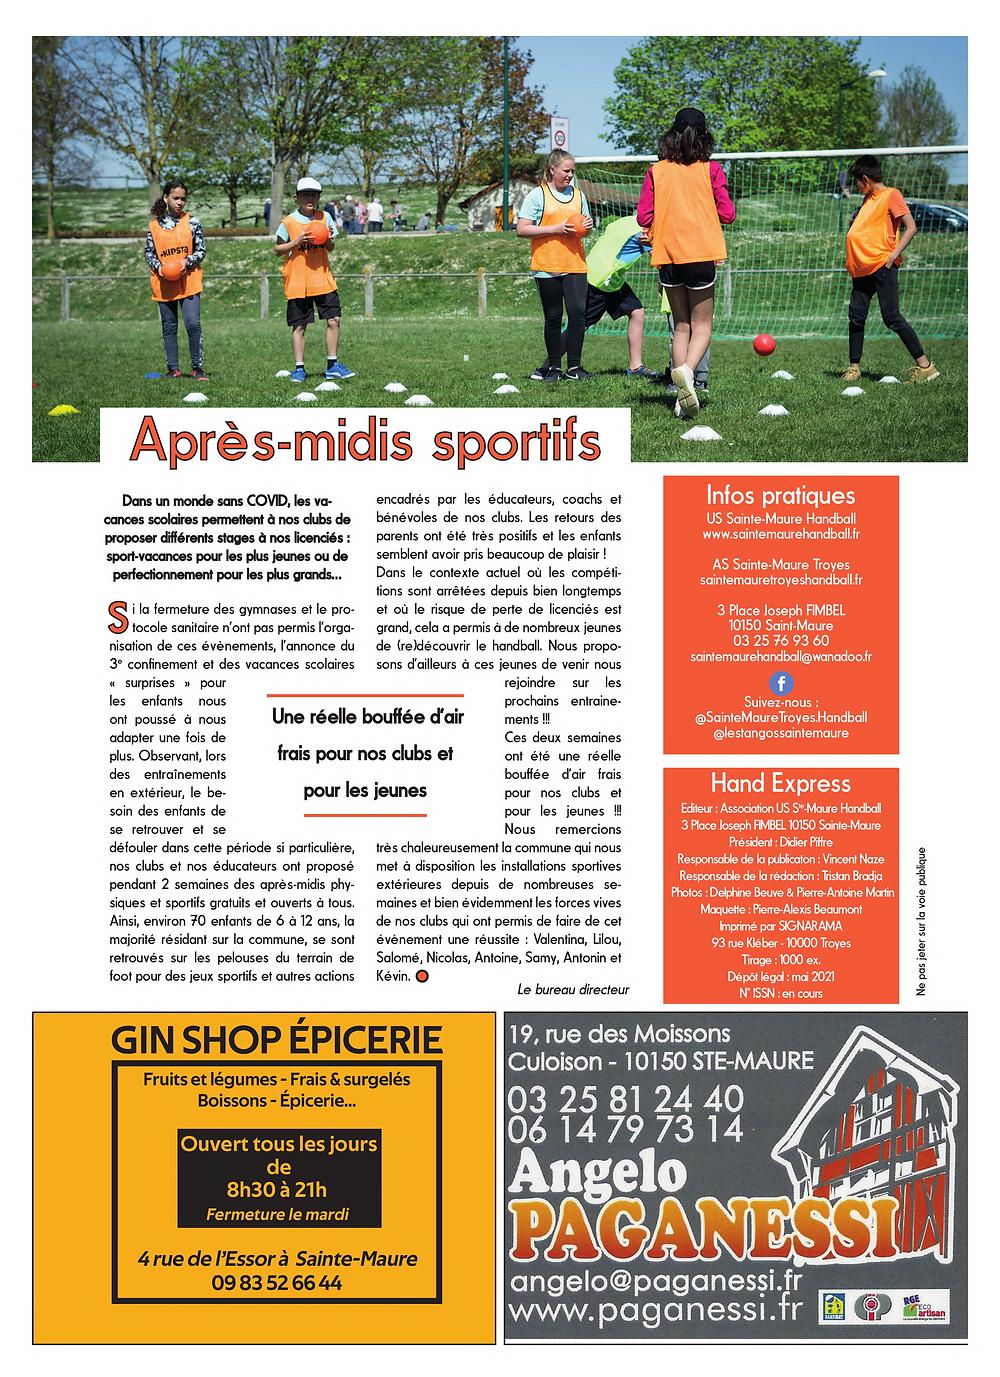 US Sainte-Maure Handball Masculin - Hand Express - Magazine Mai 2021